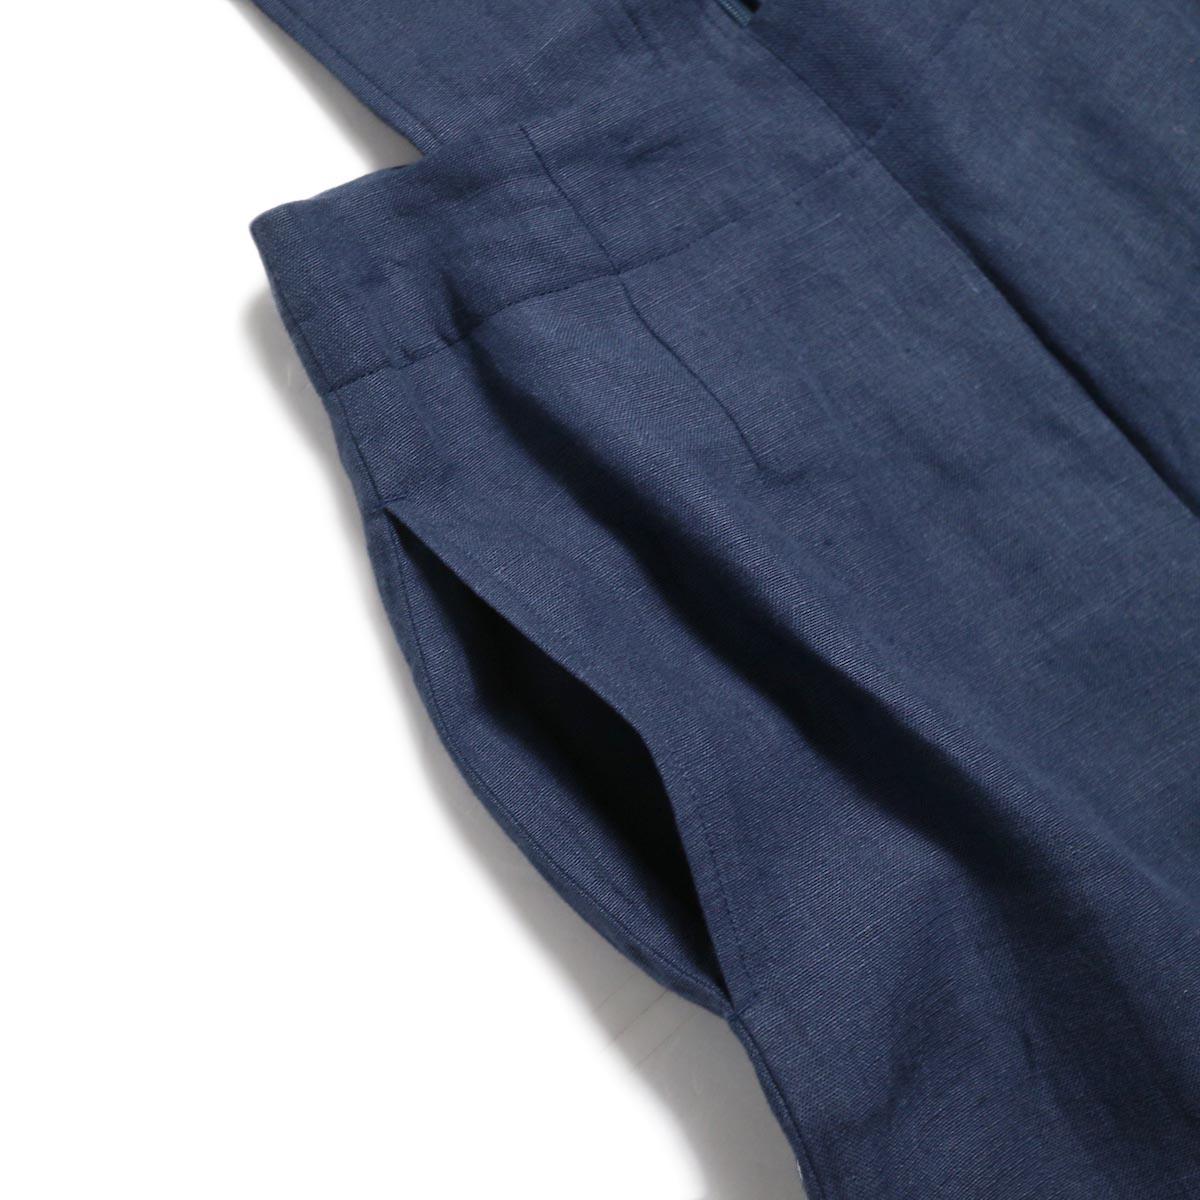 BLUEBIRD BOULEVARD / ウォッシュドリネンワイドパンツ -Navy ポケット